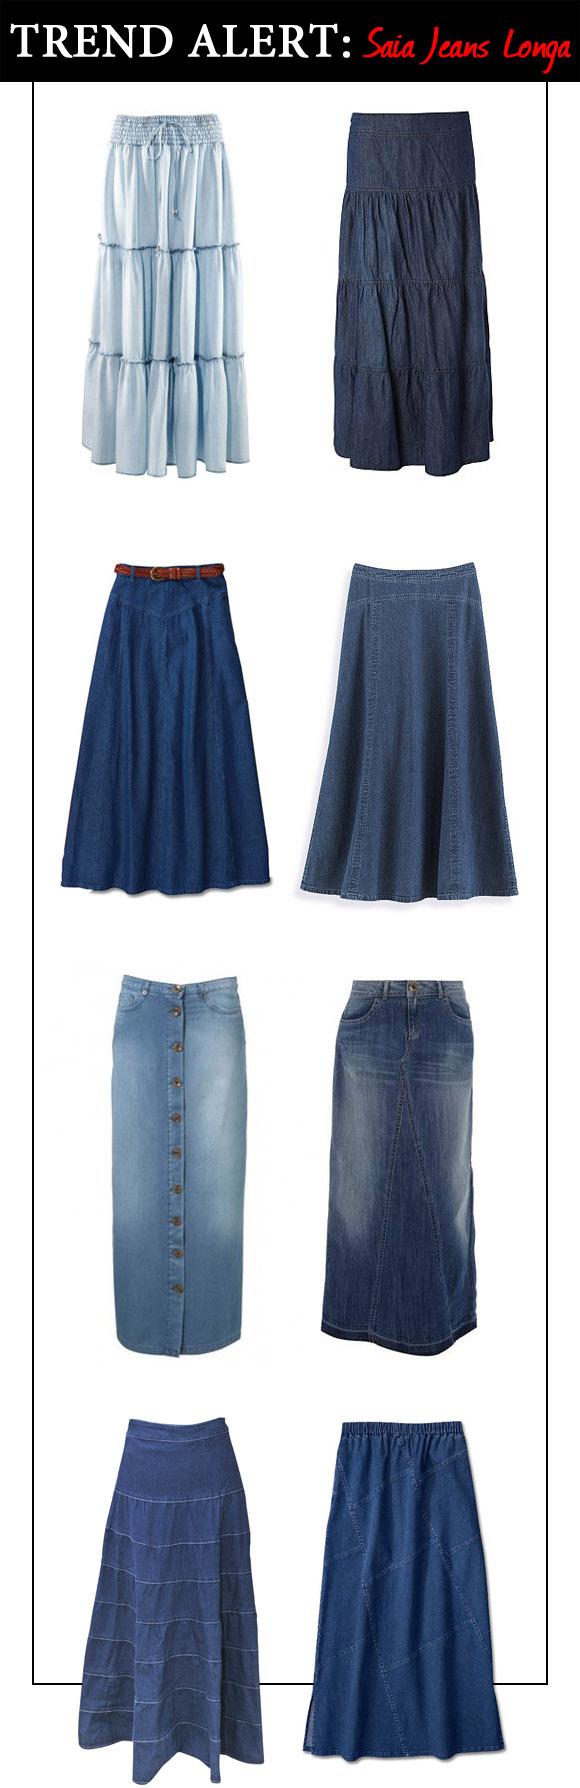 moda masculina dicas curtas looks de natal iii agrund